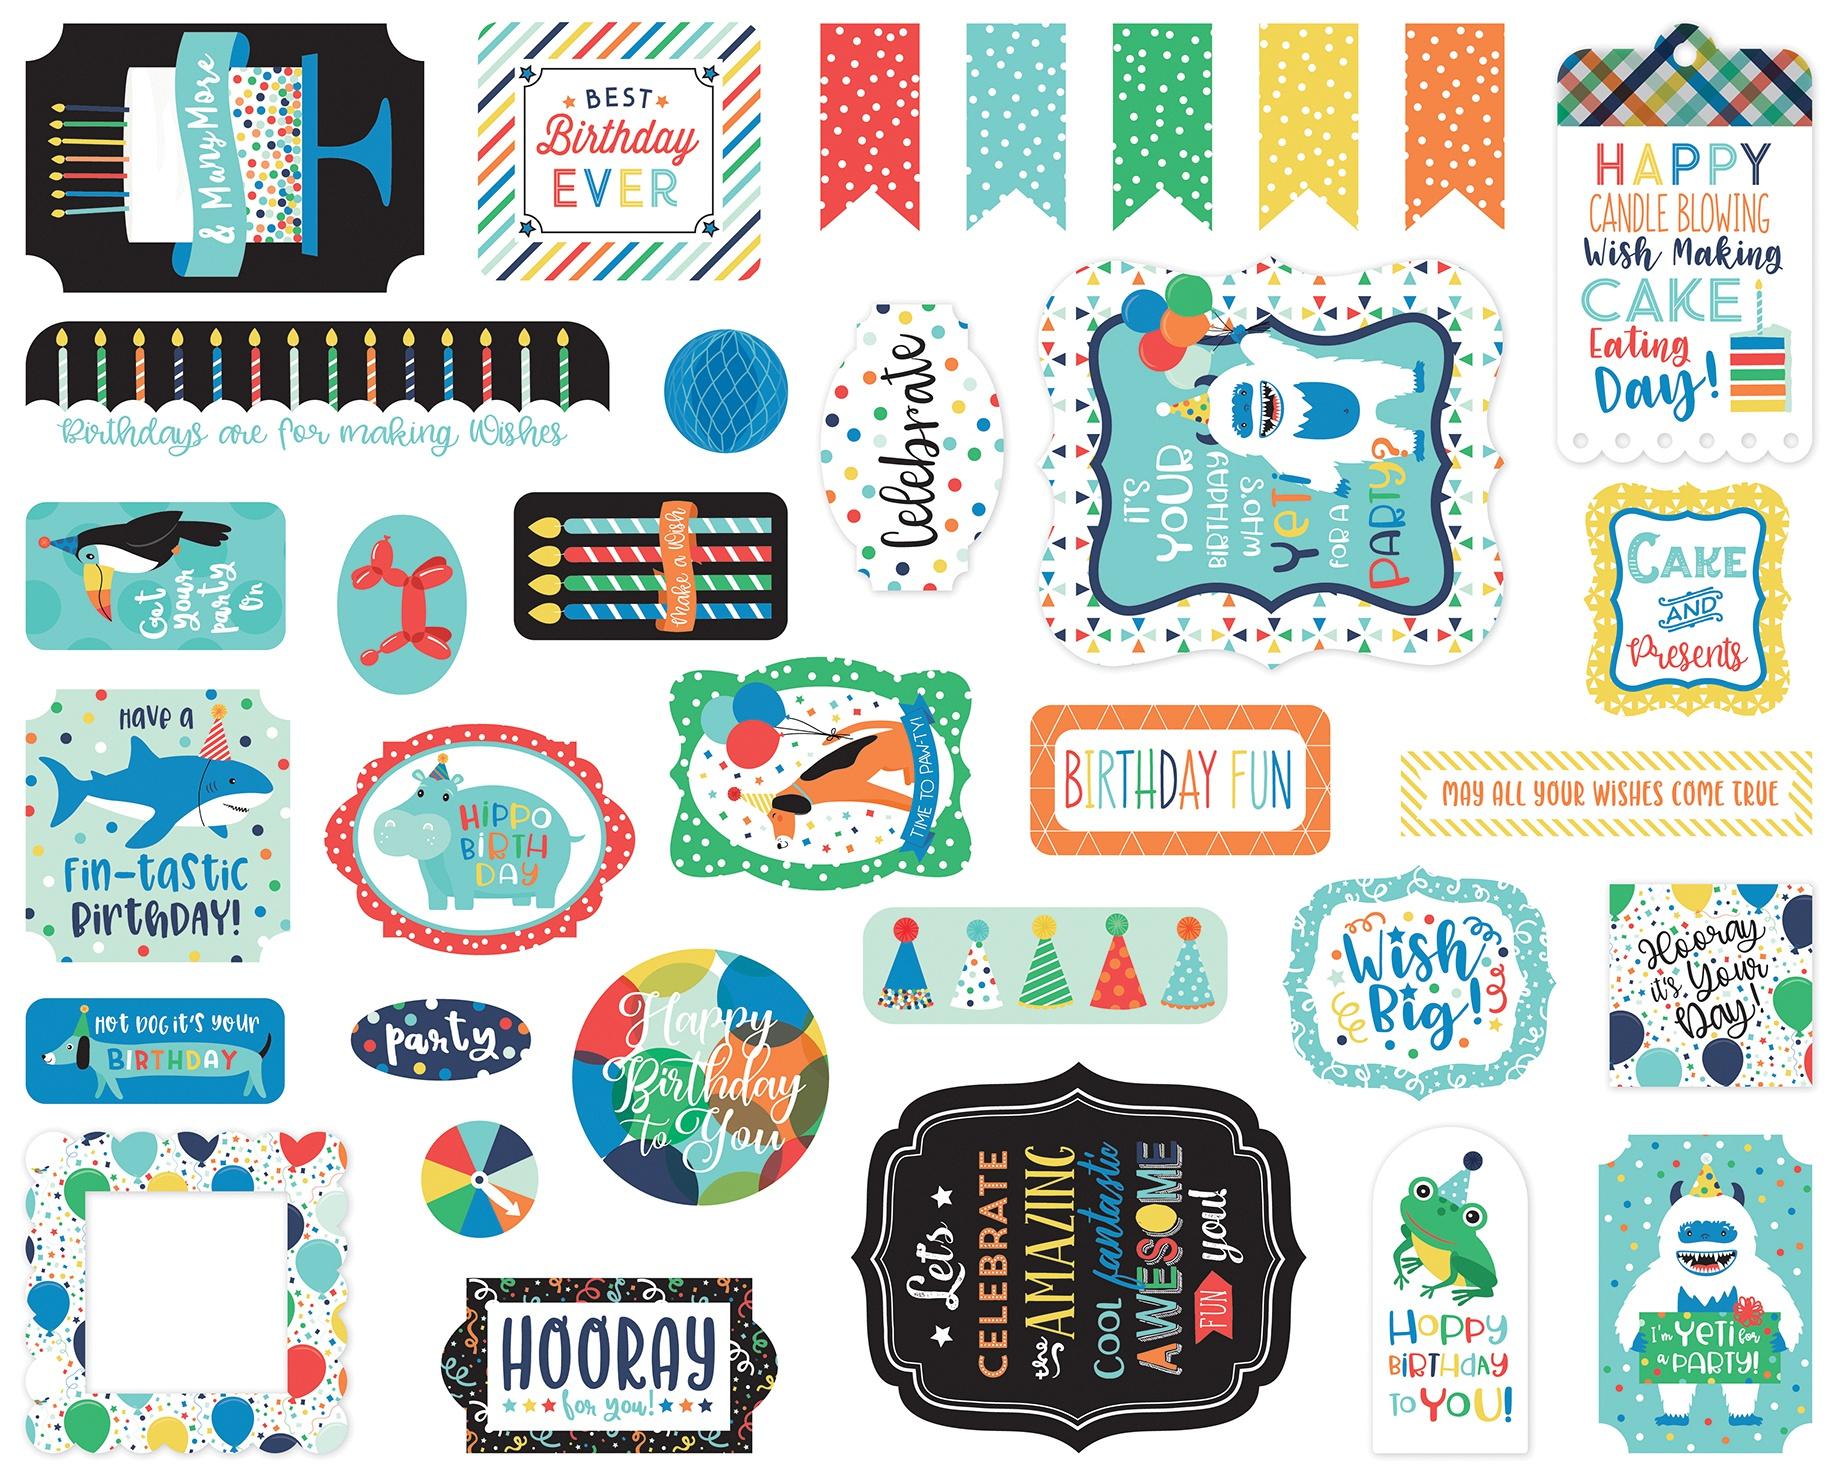 Echo Park Cardstock Ephemera 33/Pkg-Icons, It's Your Birthday Boy